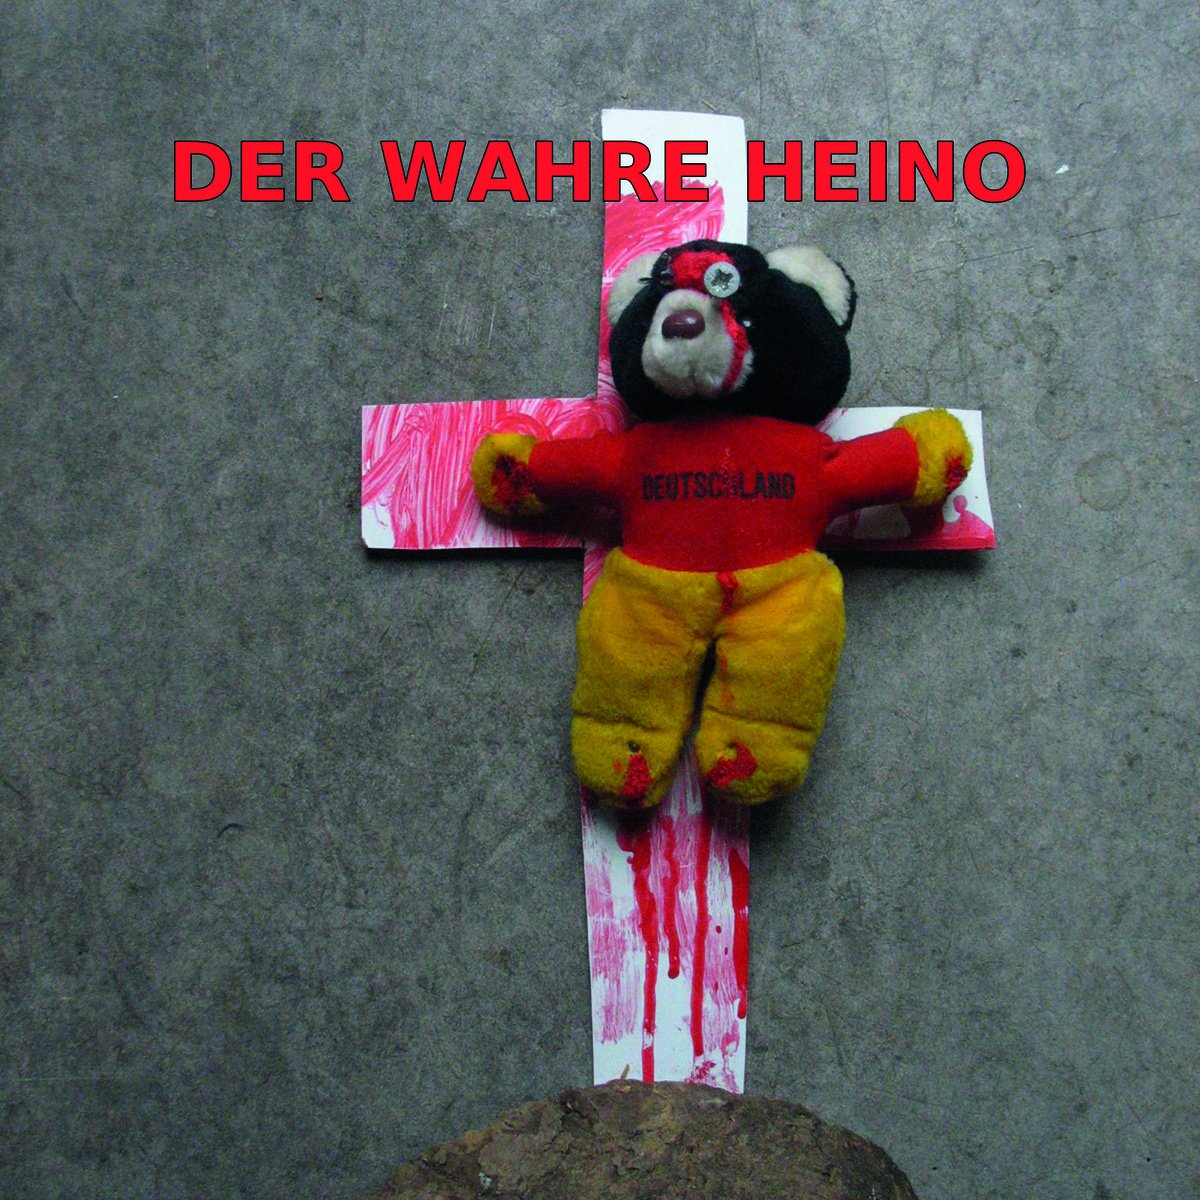 Der wahre Heino - Single-Cover